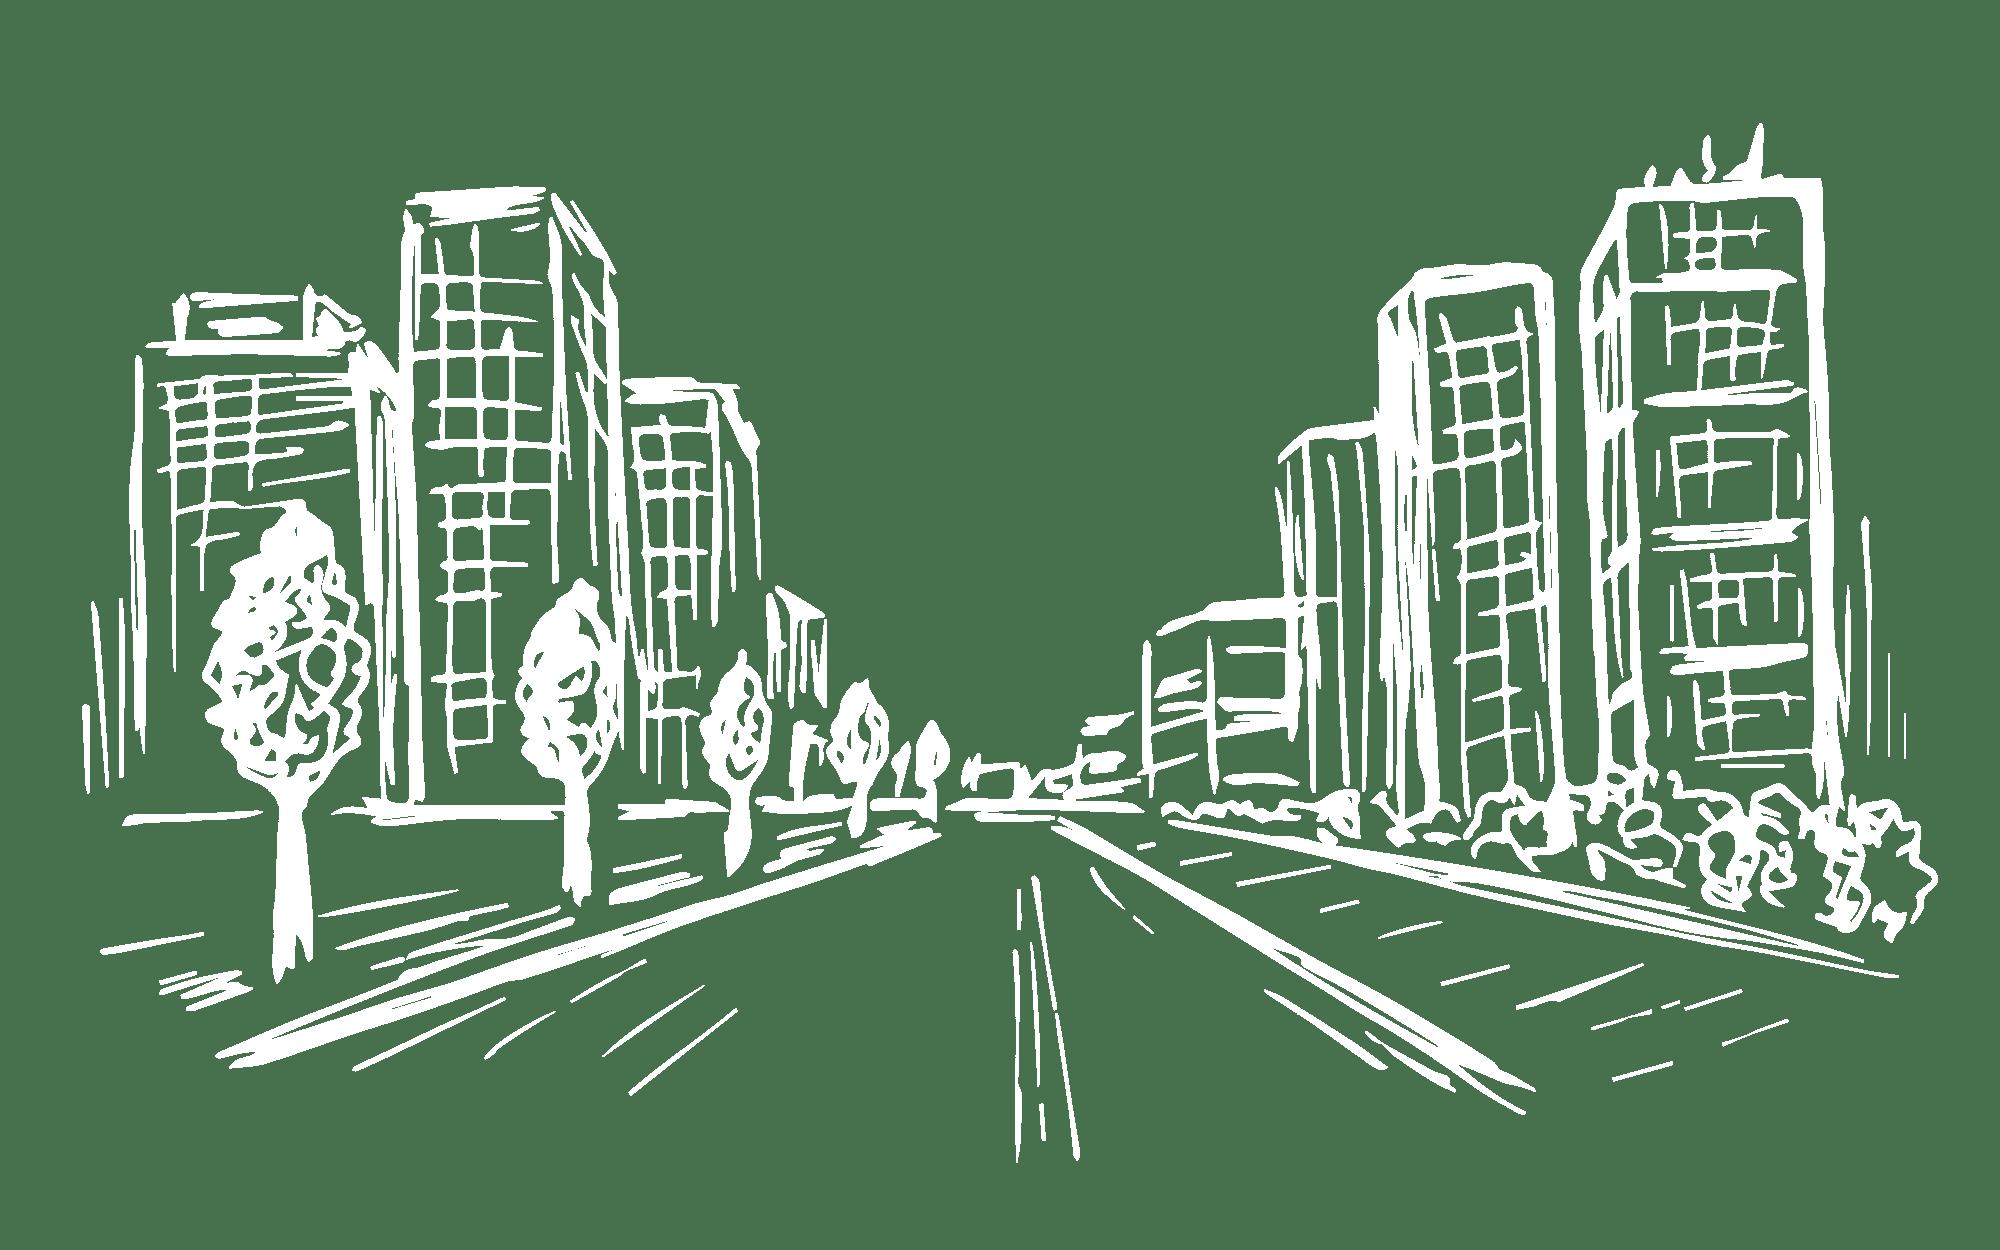 Illustration of a street for Bellrock Market Station in Katy, Texas